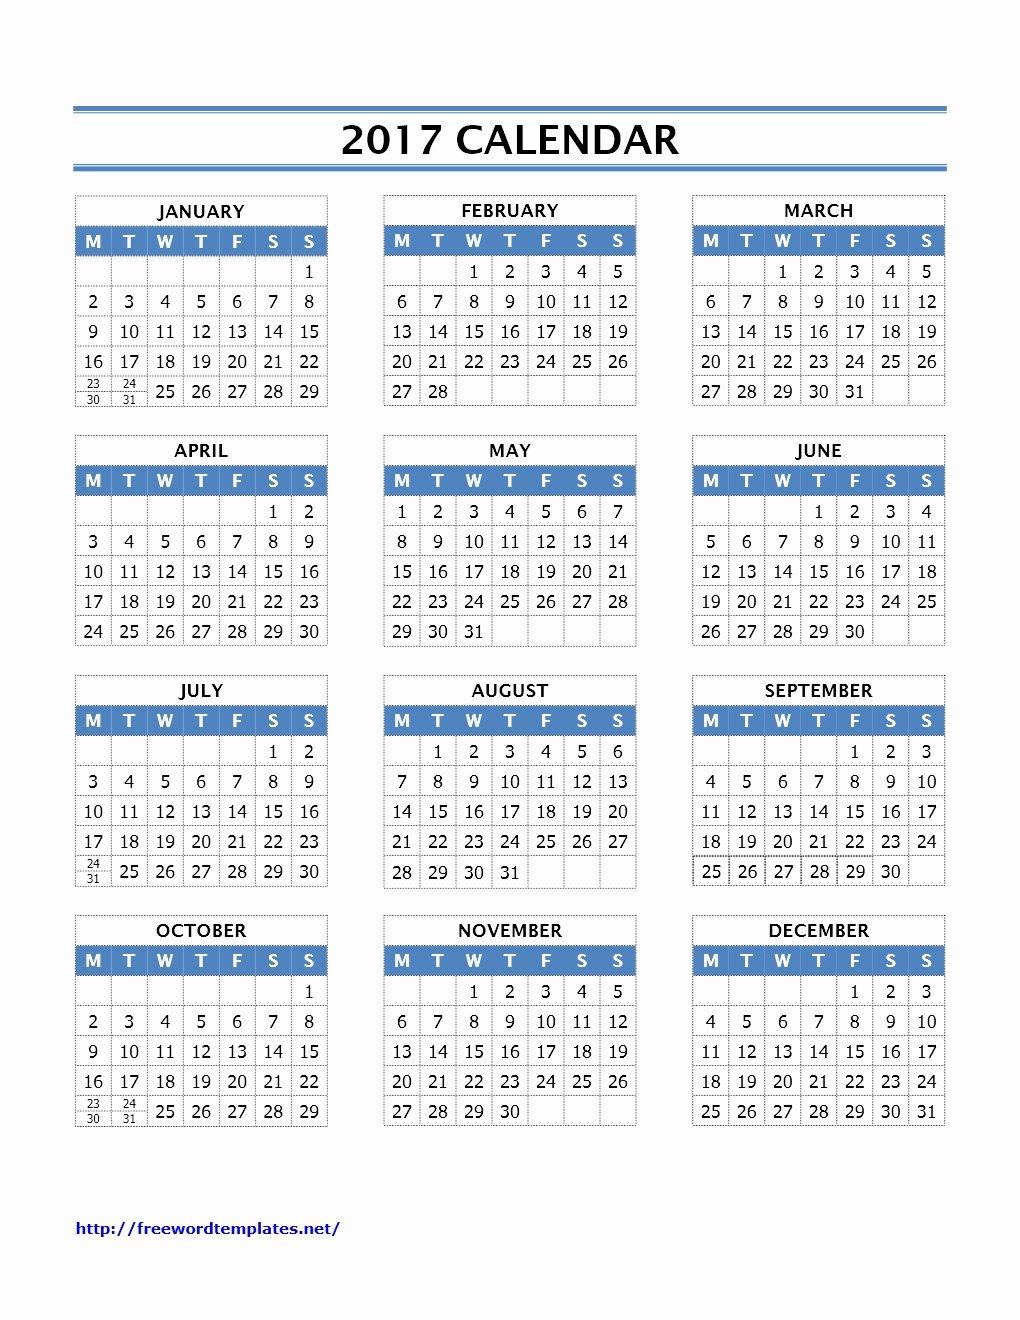 Create Calendar In Word Inspirational 2017 Calendar Templates